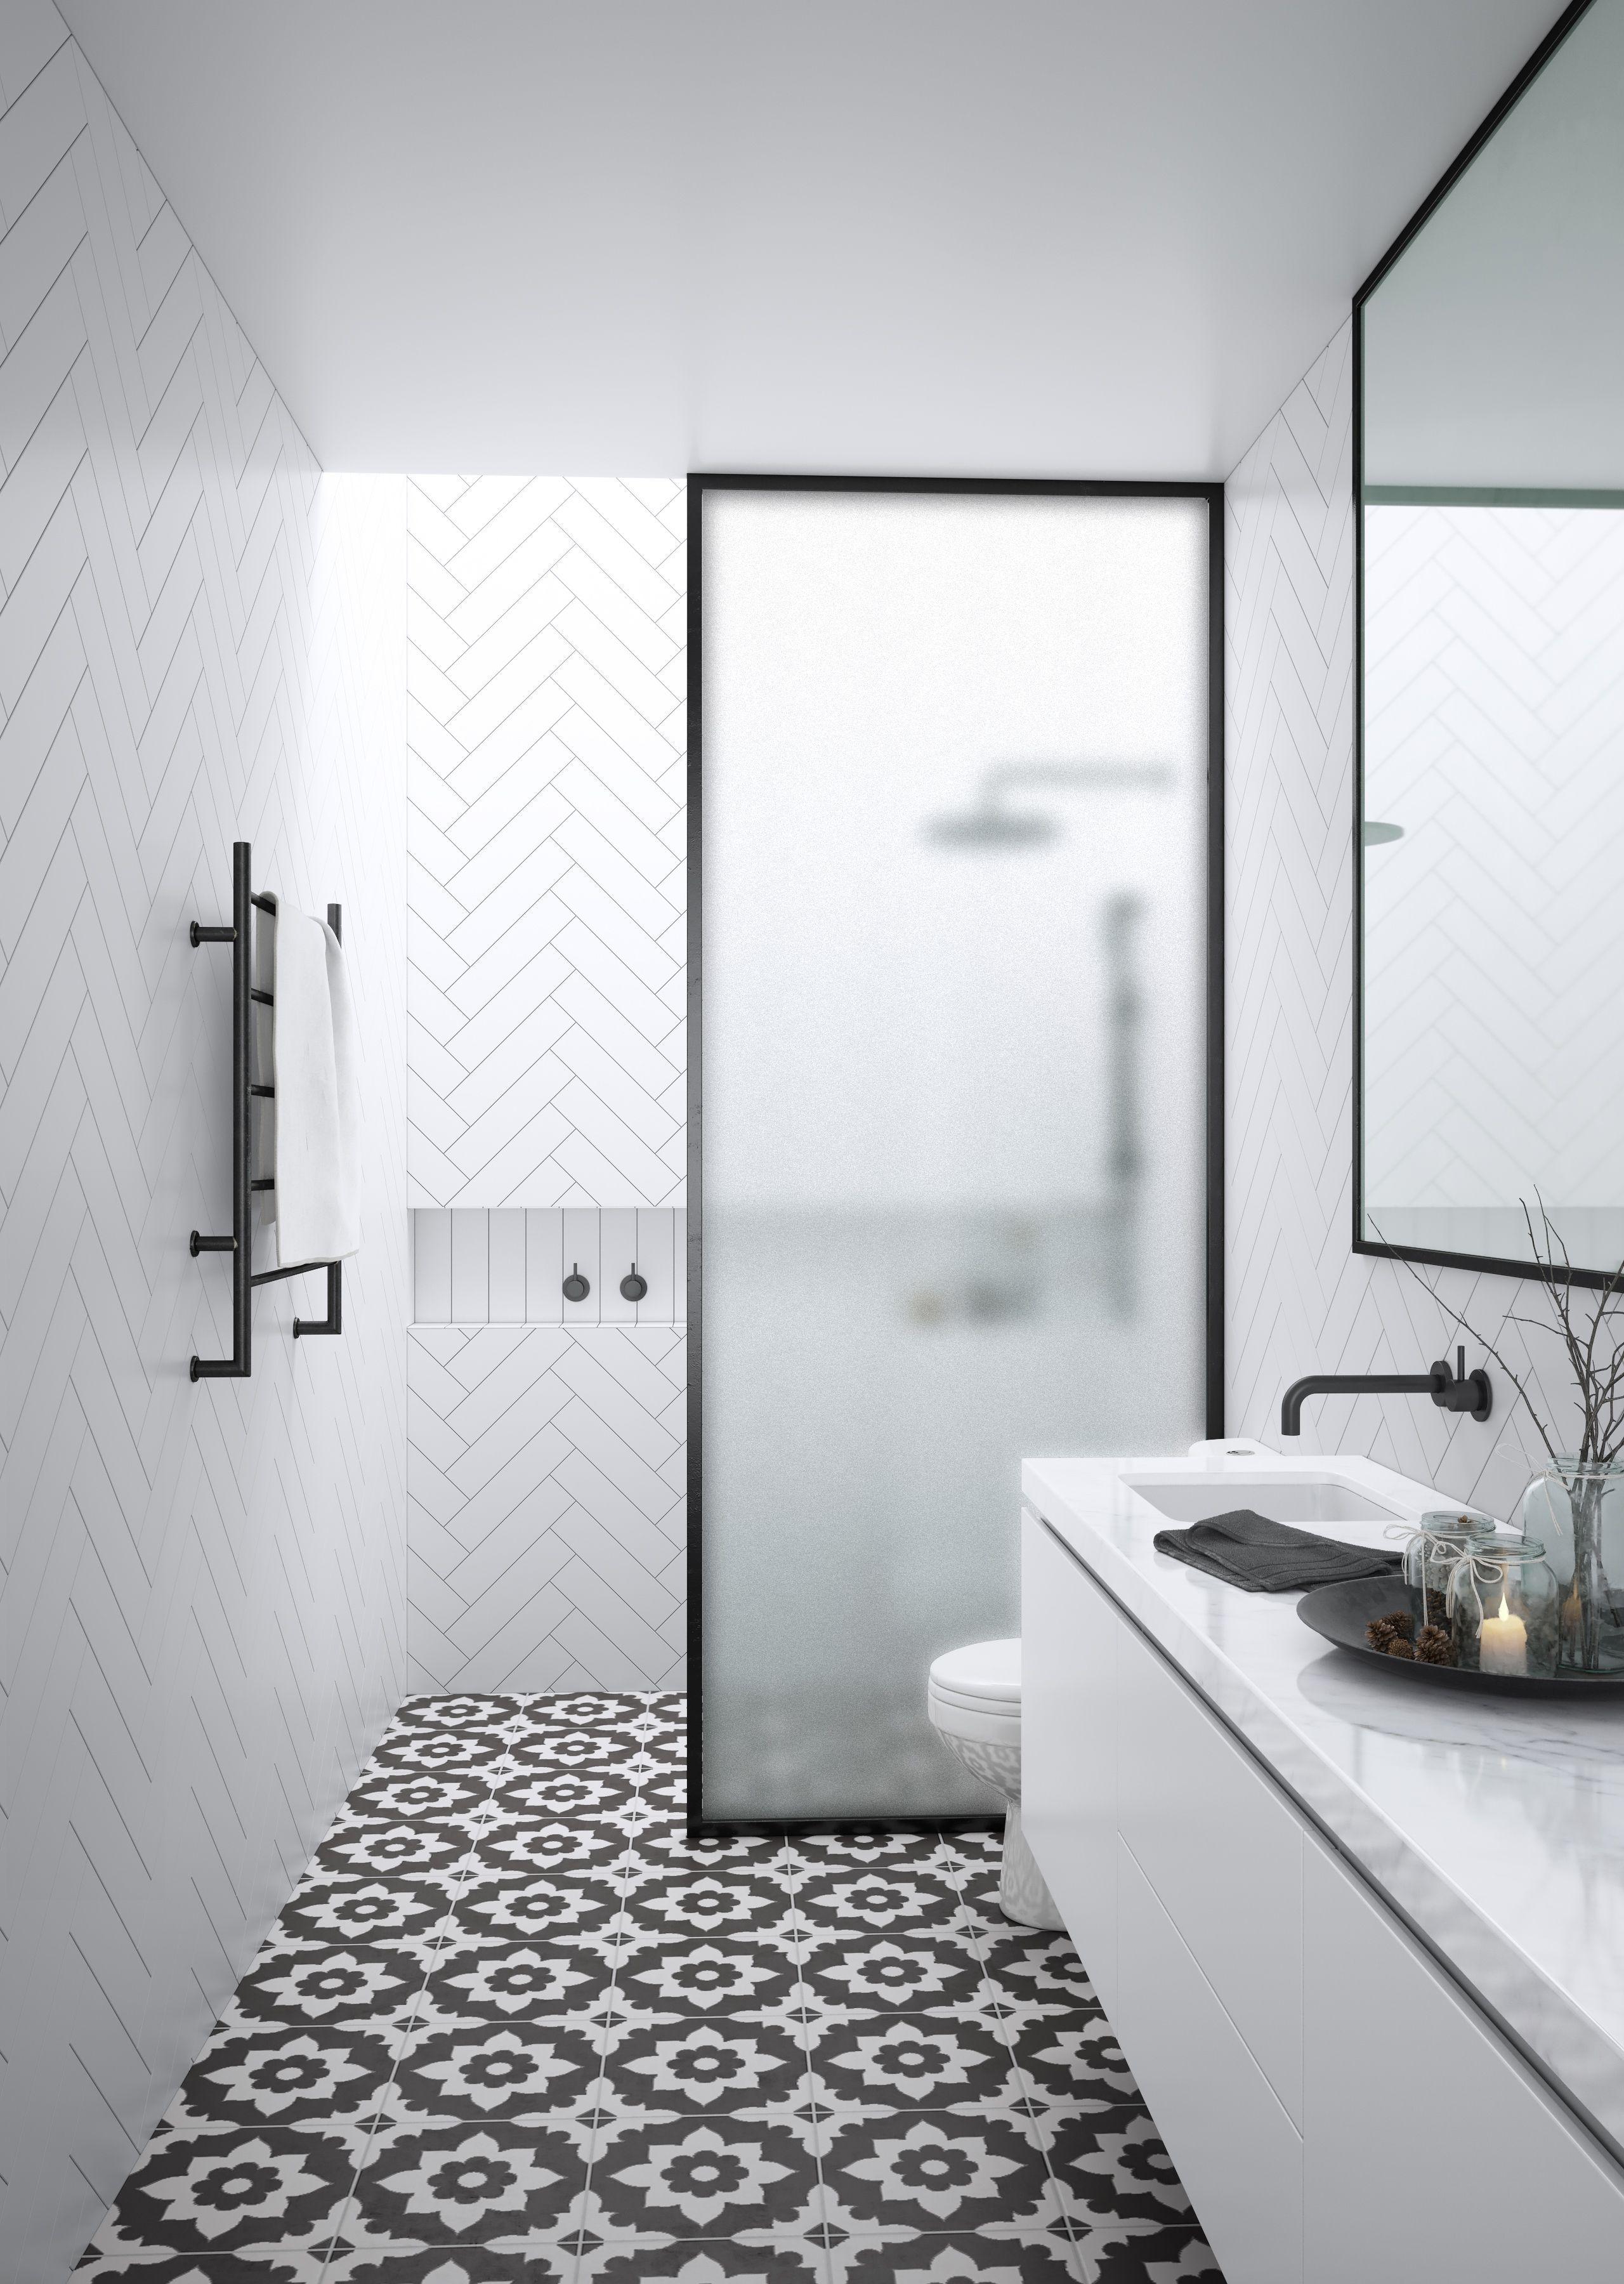 Crittall Style Industrial Shower Panels Bathroom Trends Big Bathroom Designs Window In Shower